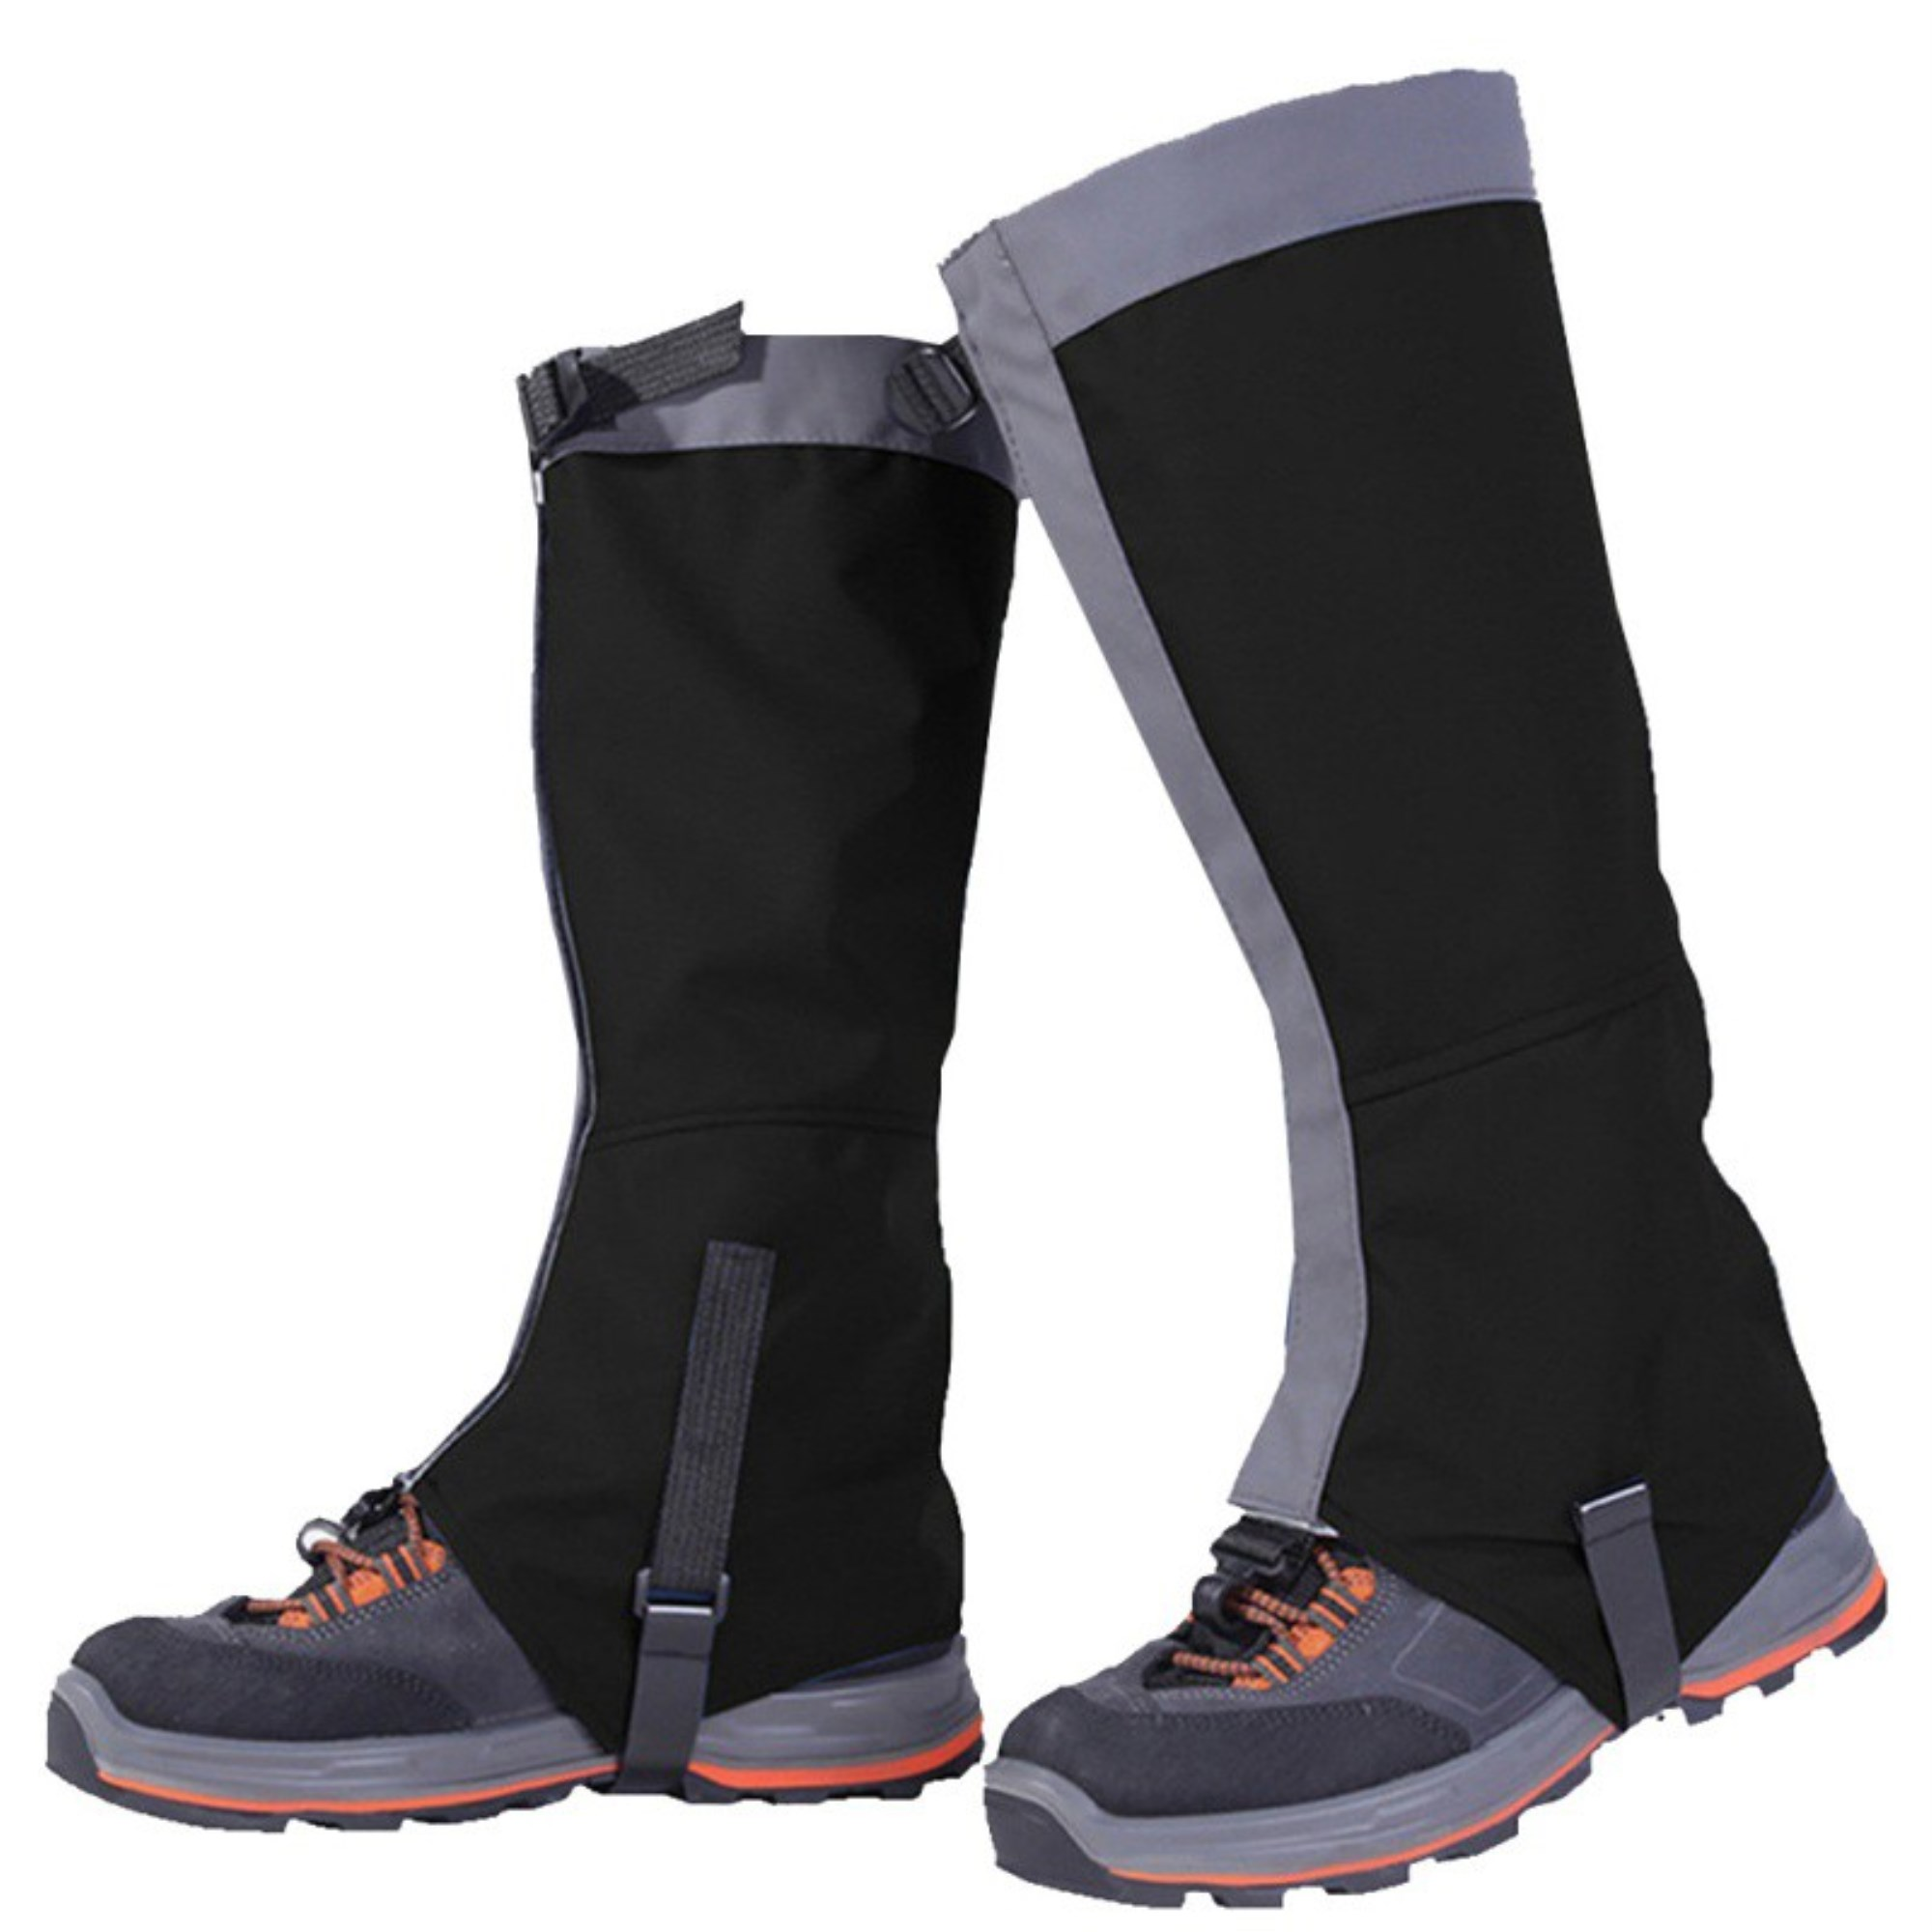 Waterproof Outdoor Hiking Boots Snow Kids Gaiters Walking Climbing Camping DRACO